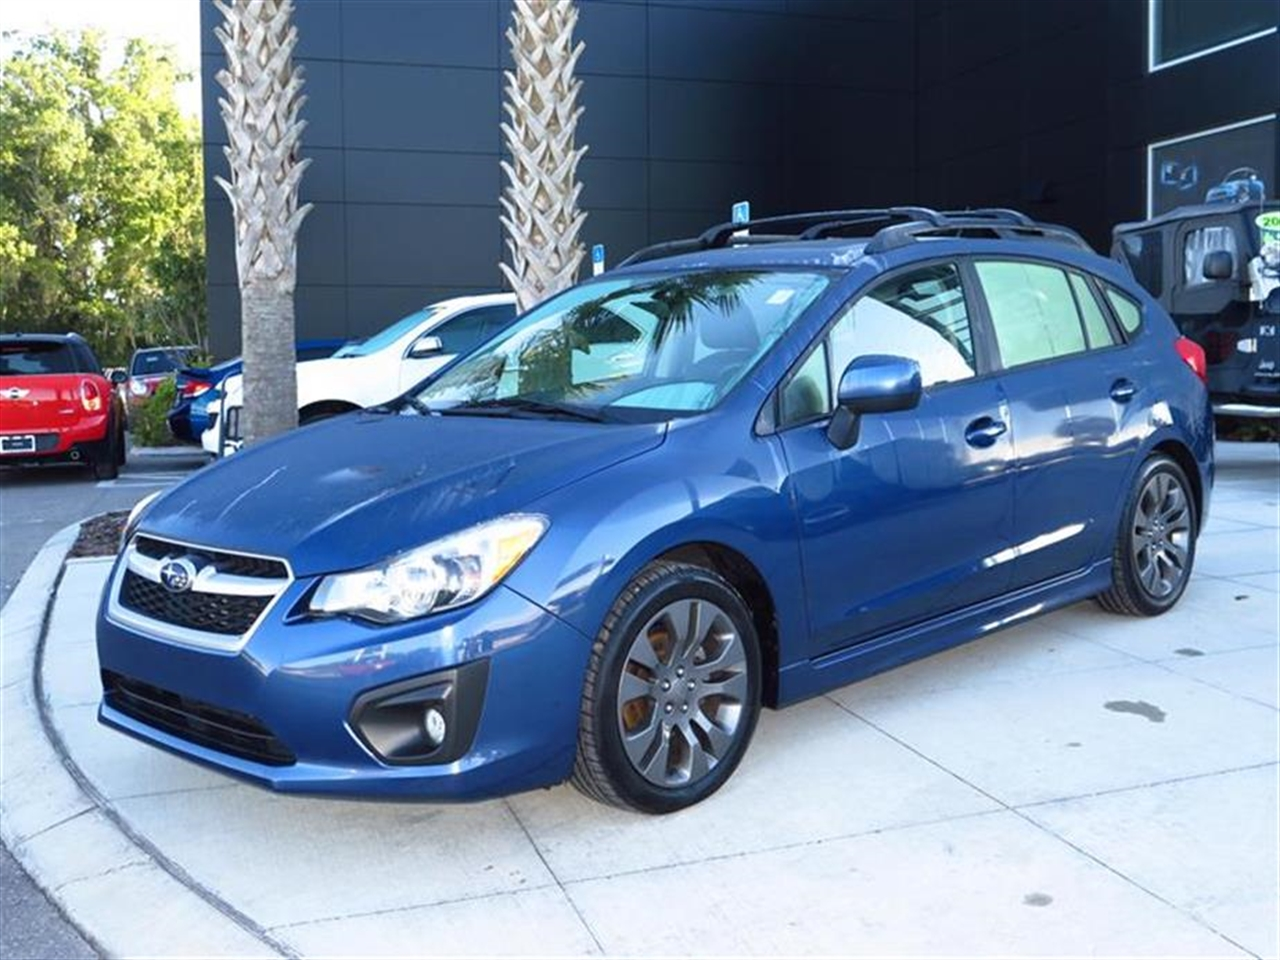 2012 SUBARU IMPREZA WAGON 5dr Auto 20i Sport Limited 58236 miles 12V pwr outlets -inc dash cent